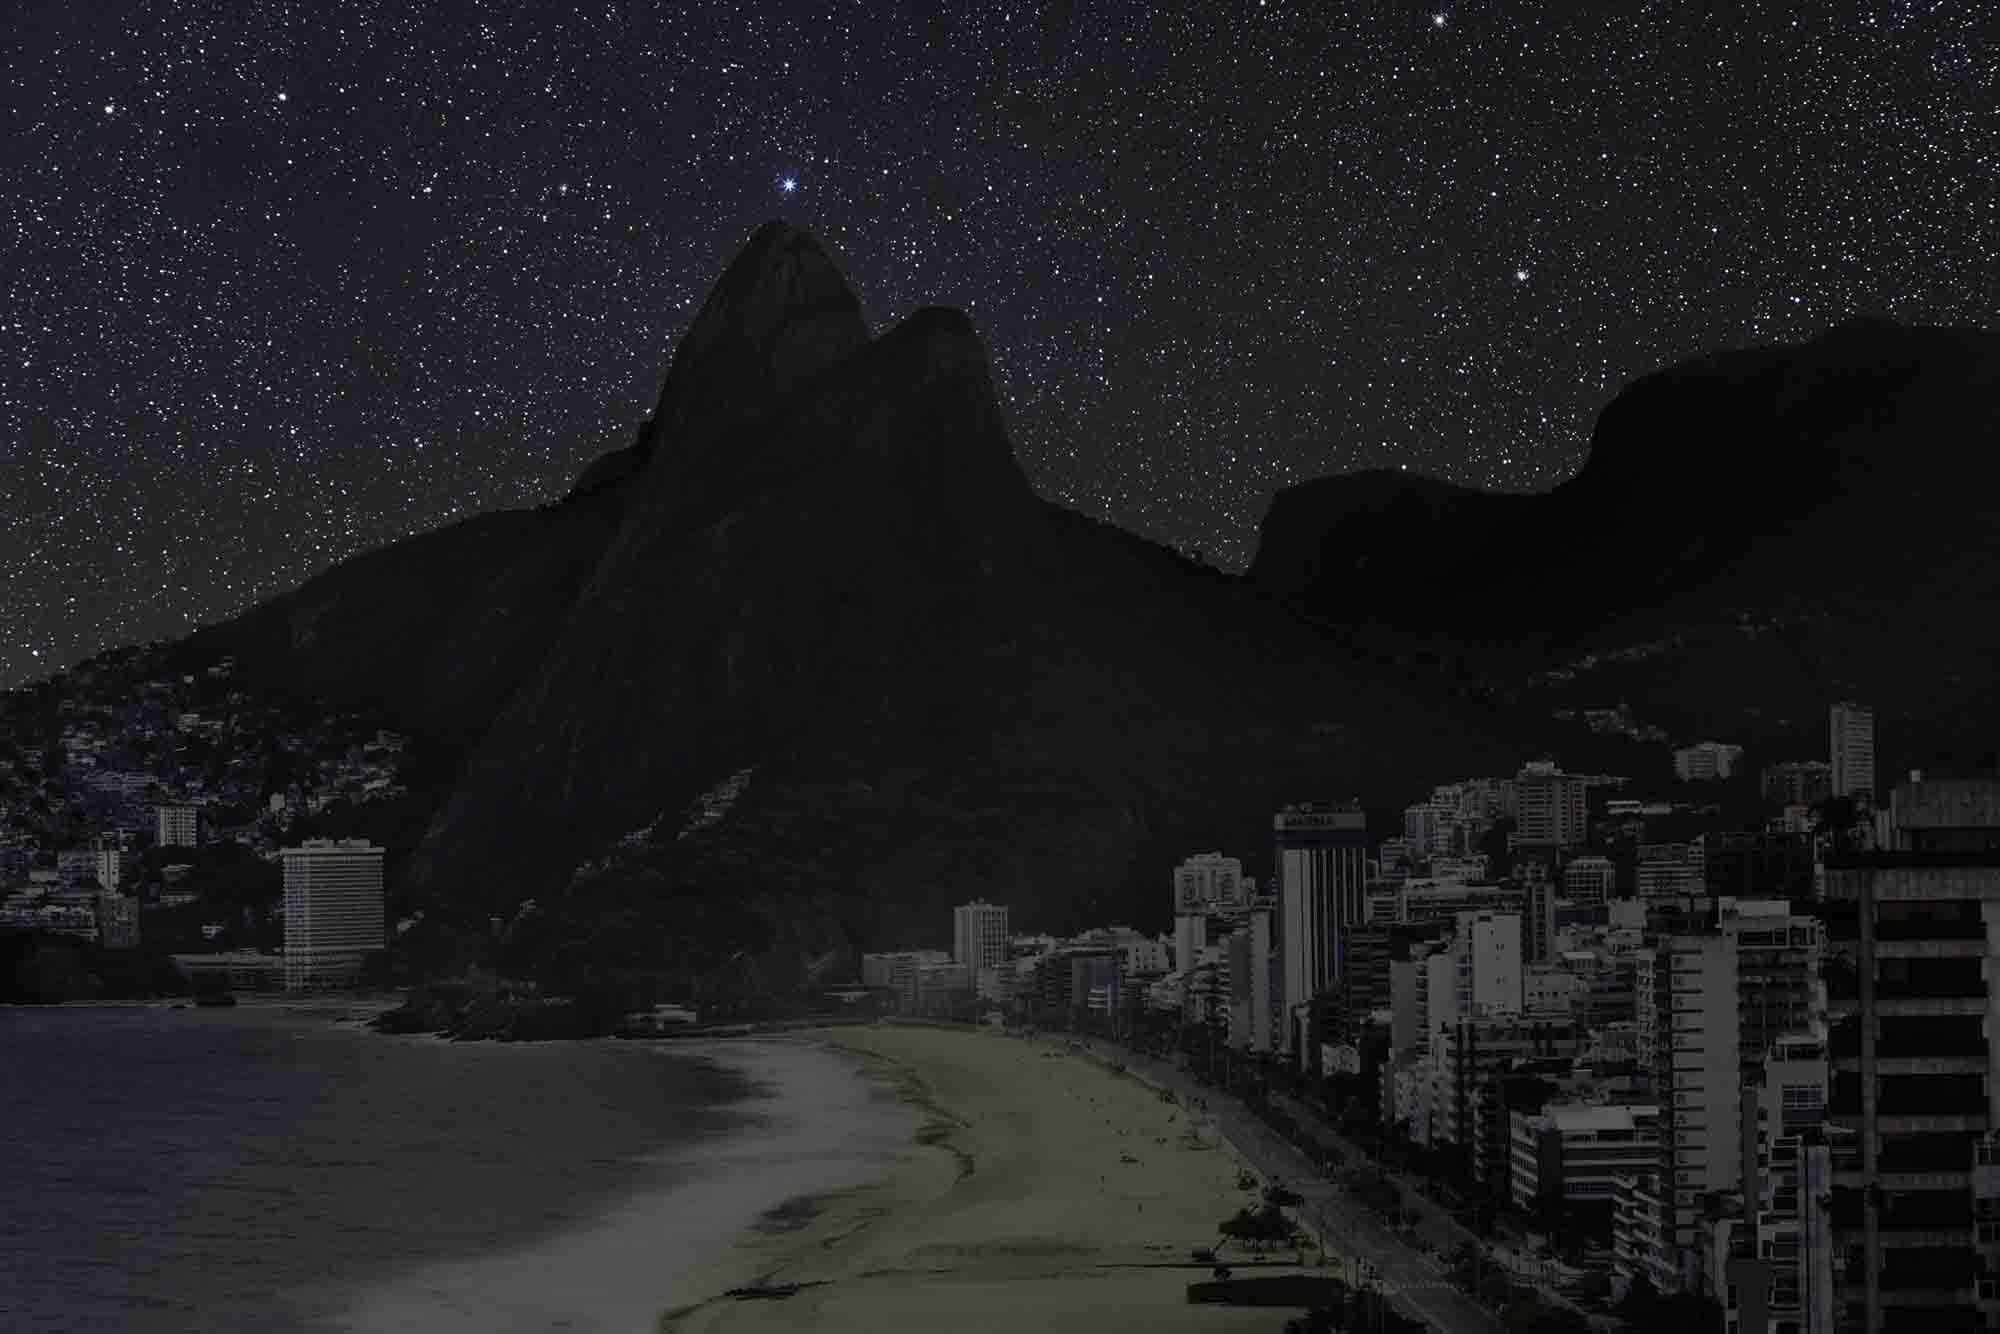 Rio de Janeiro 22° 59' 10'' S 2011-06-04 lst 22:04<br/>Darkened Cities - Villes éteintes